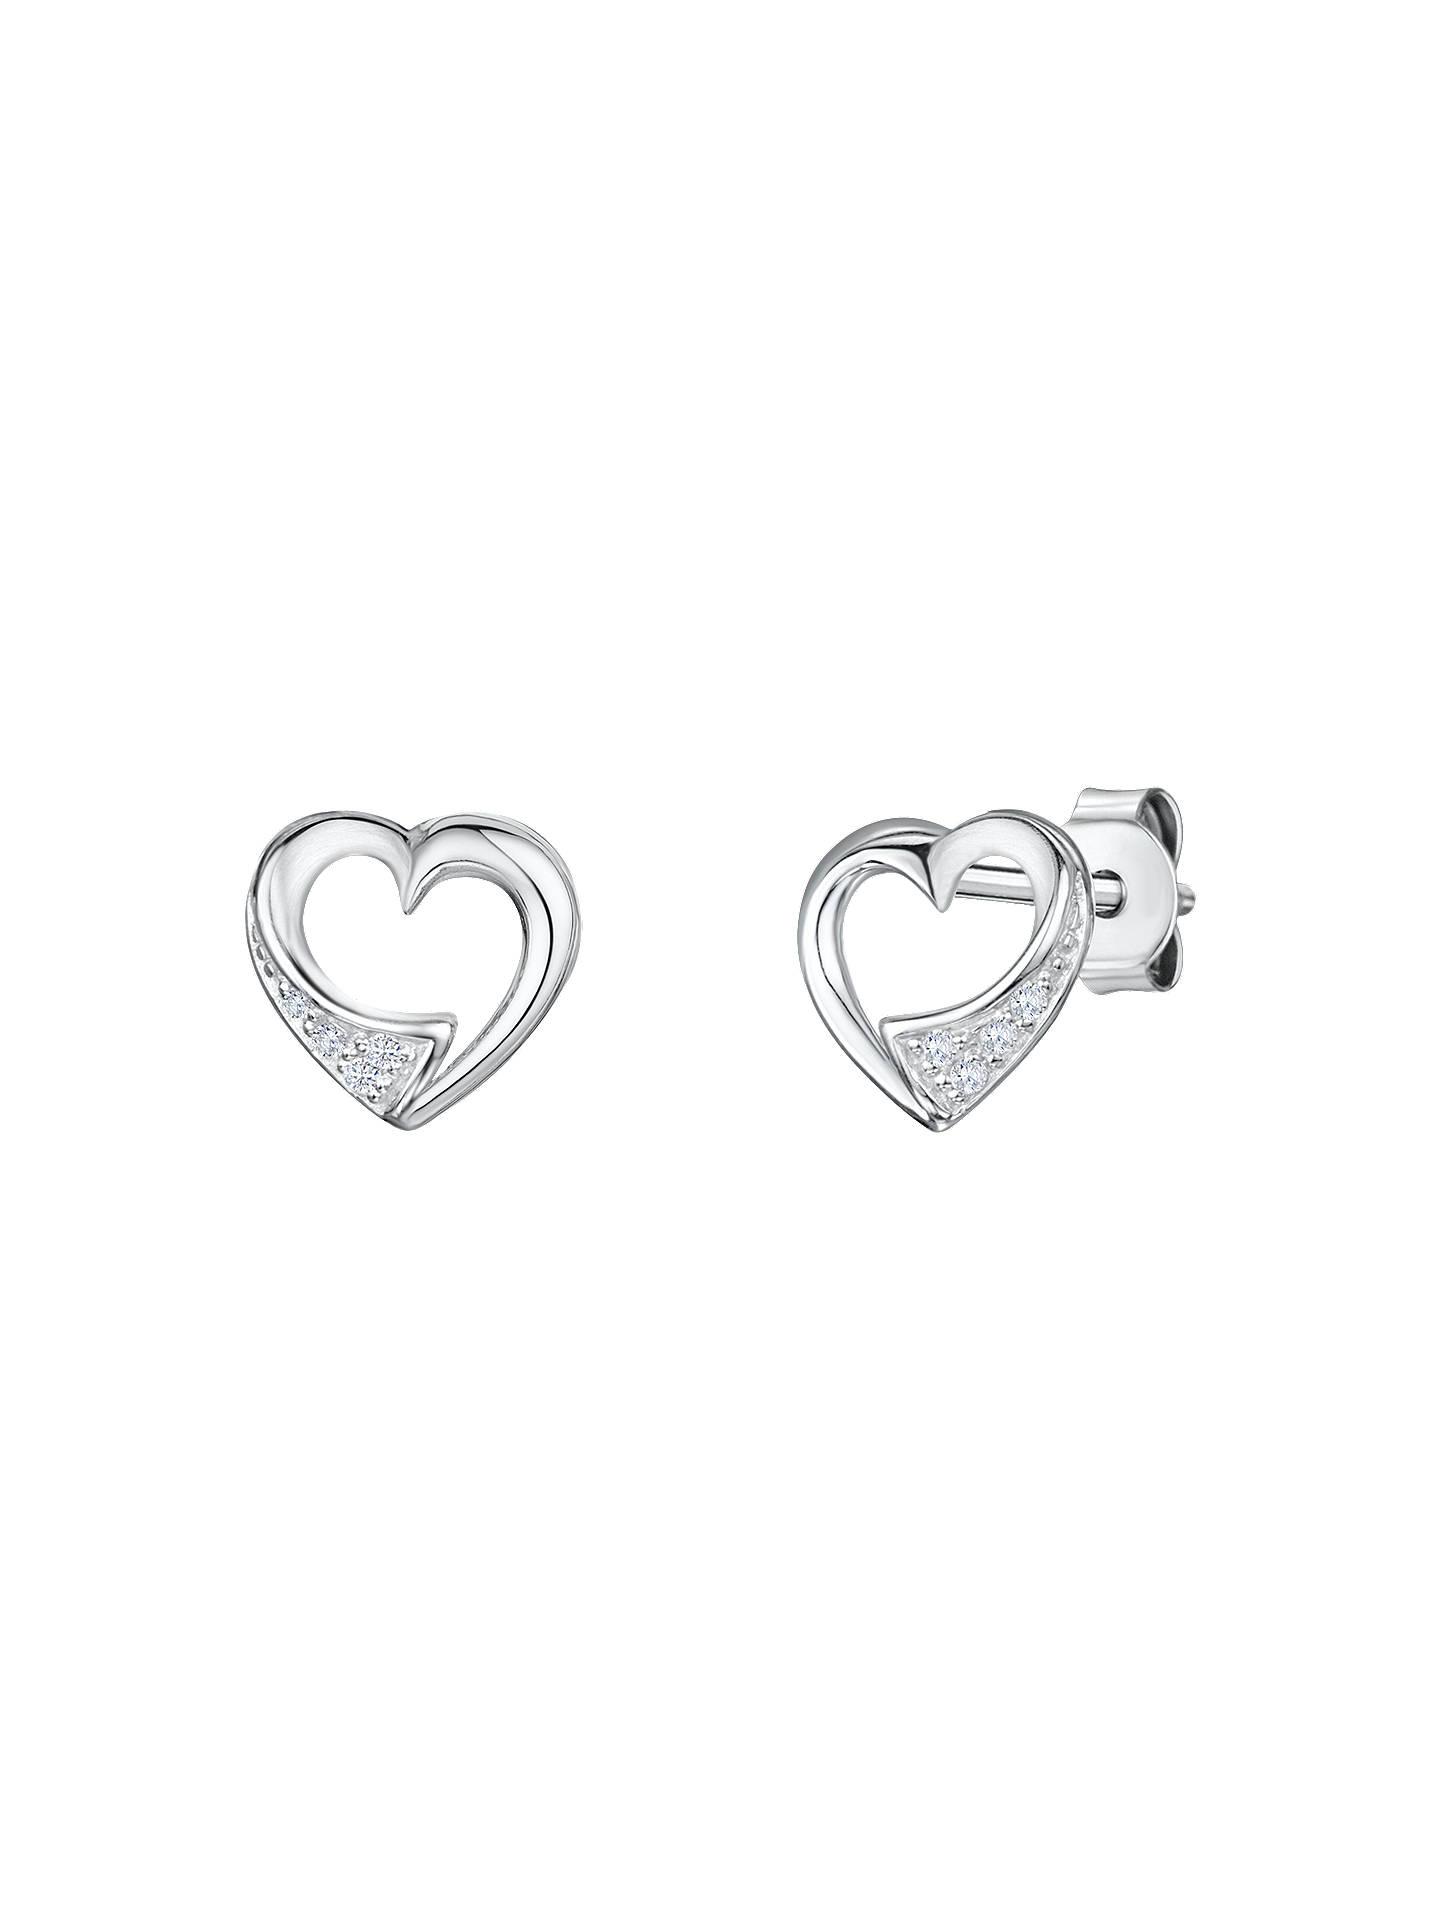 2dbcfdbec Buy Jools by Jenny Brown Cubic Zirconia Hollow Heart Stud Earrings, Silver  Online at johnlewis